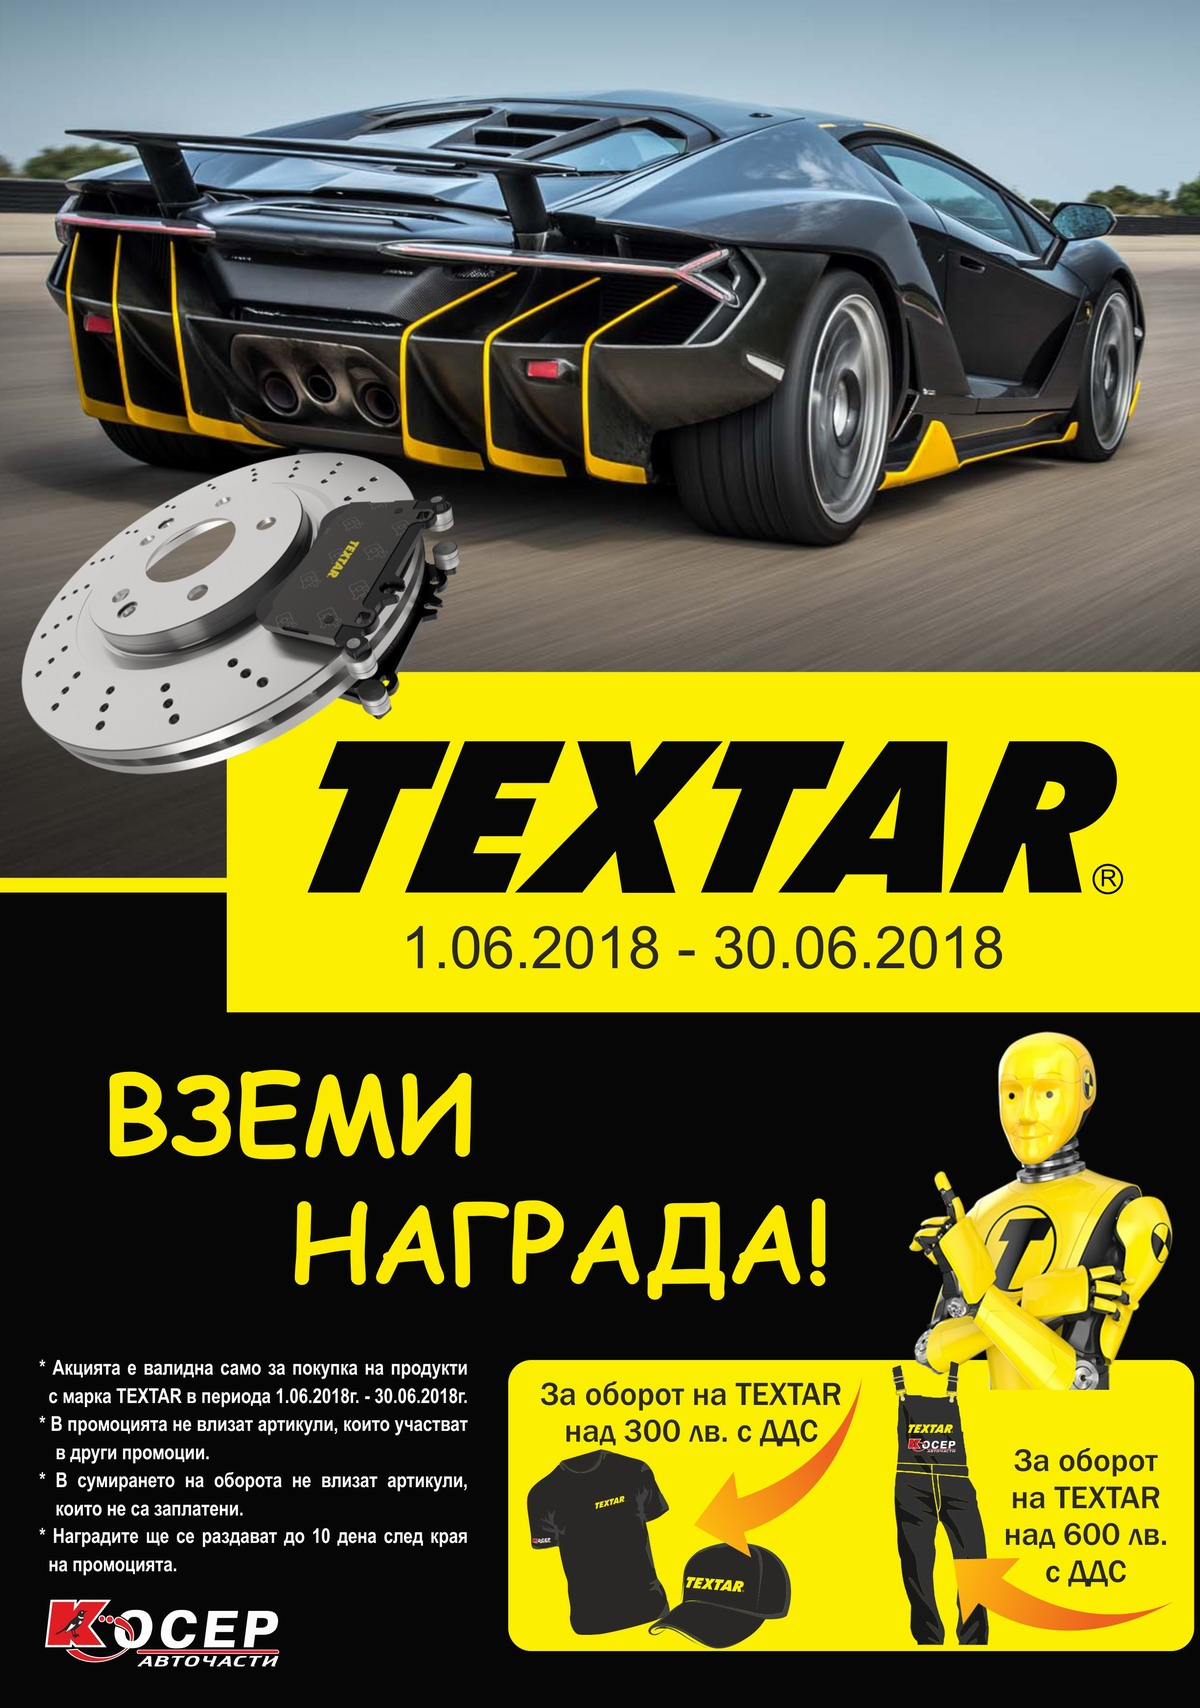 Промоция TEXTAR, 01.06.2018 - 30.06.2018